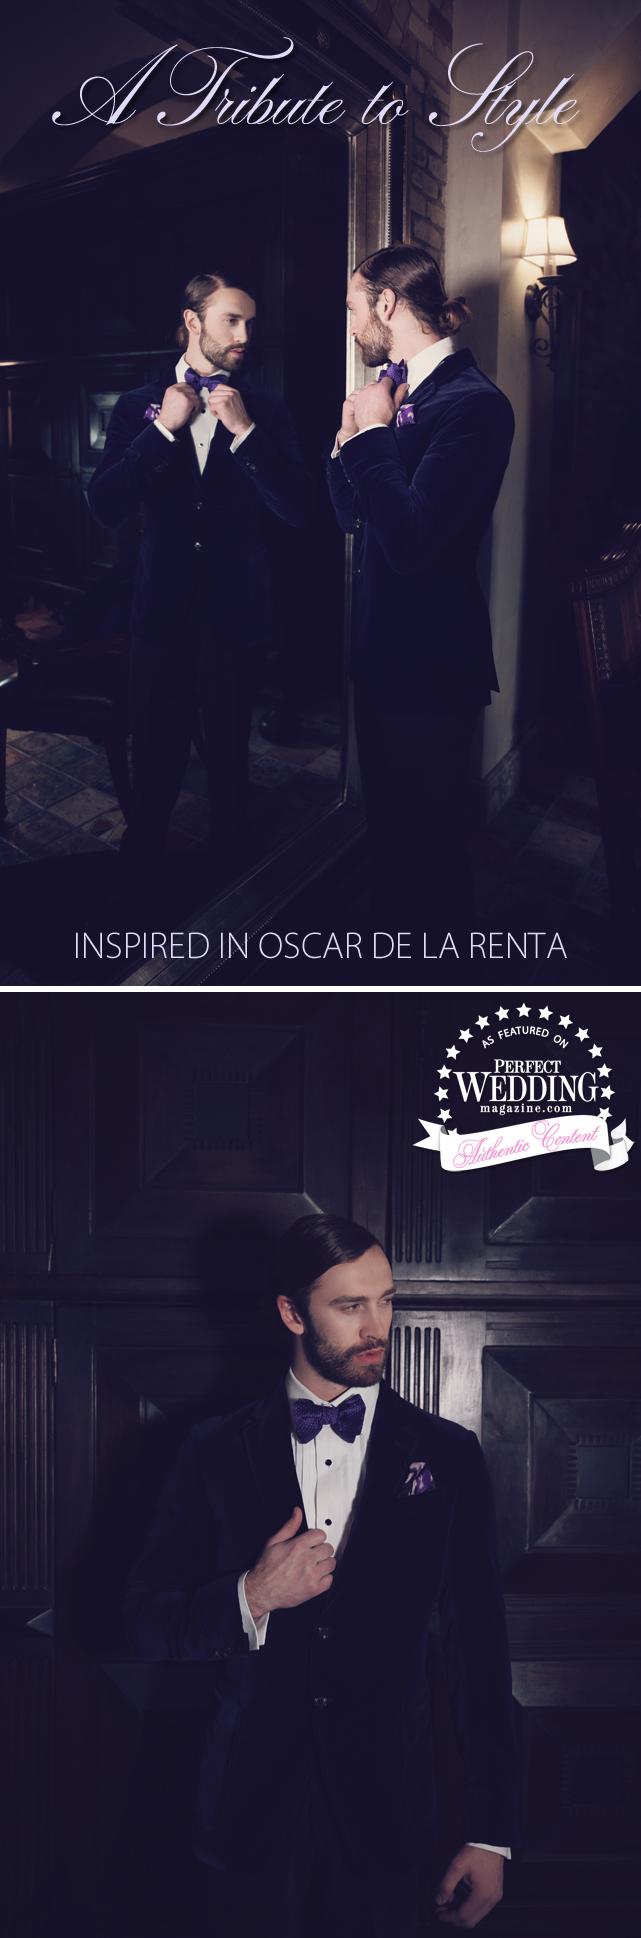 Oscar de la Renta, Oscar de la Renta Wedding theme, Wedding Décor, Floral trends, Hacienda Weddings, Bridal Fashion, Groom Attire, Perfect Wedding Magazine,A TRIBUTE TO STYLE